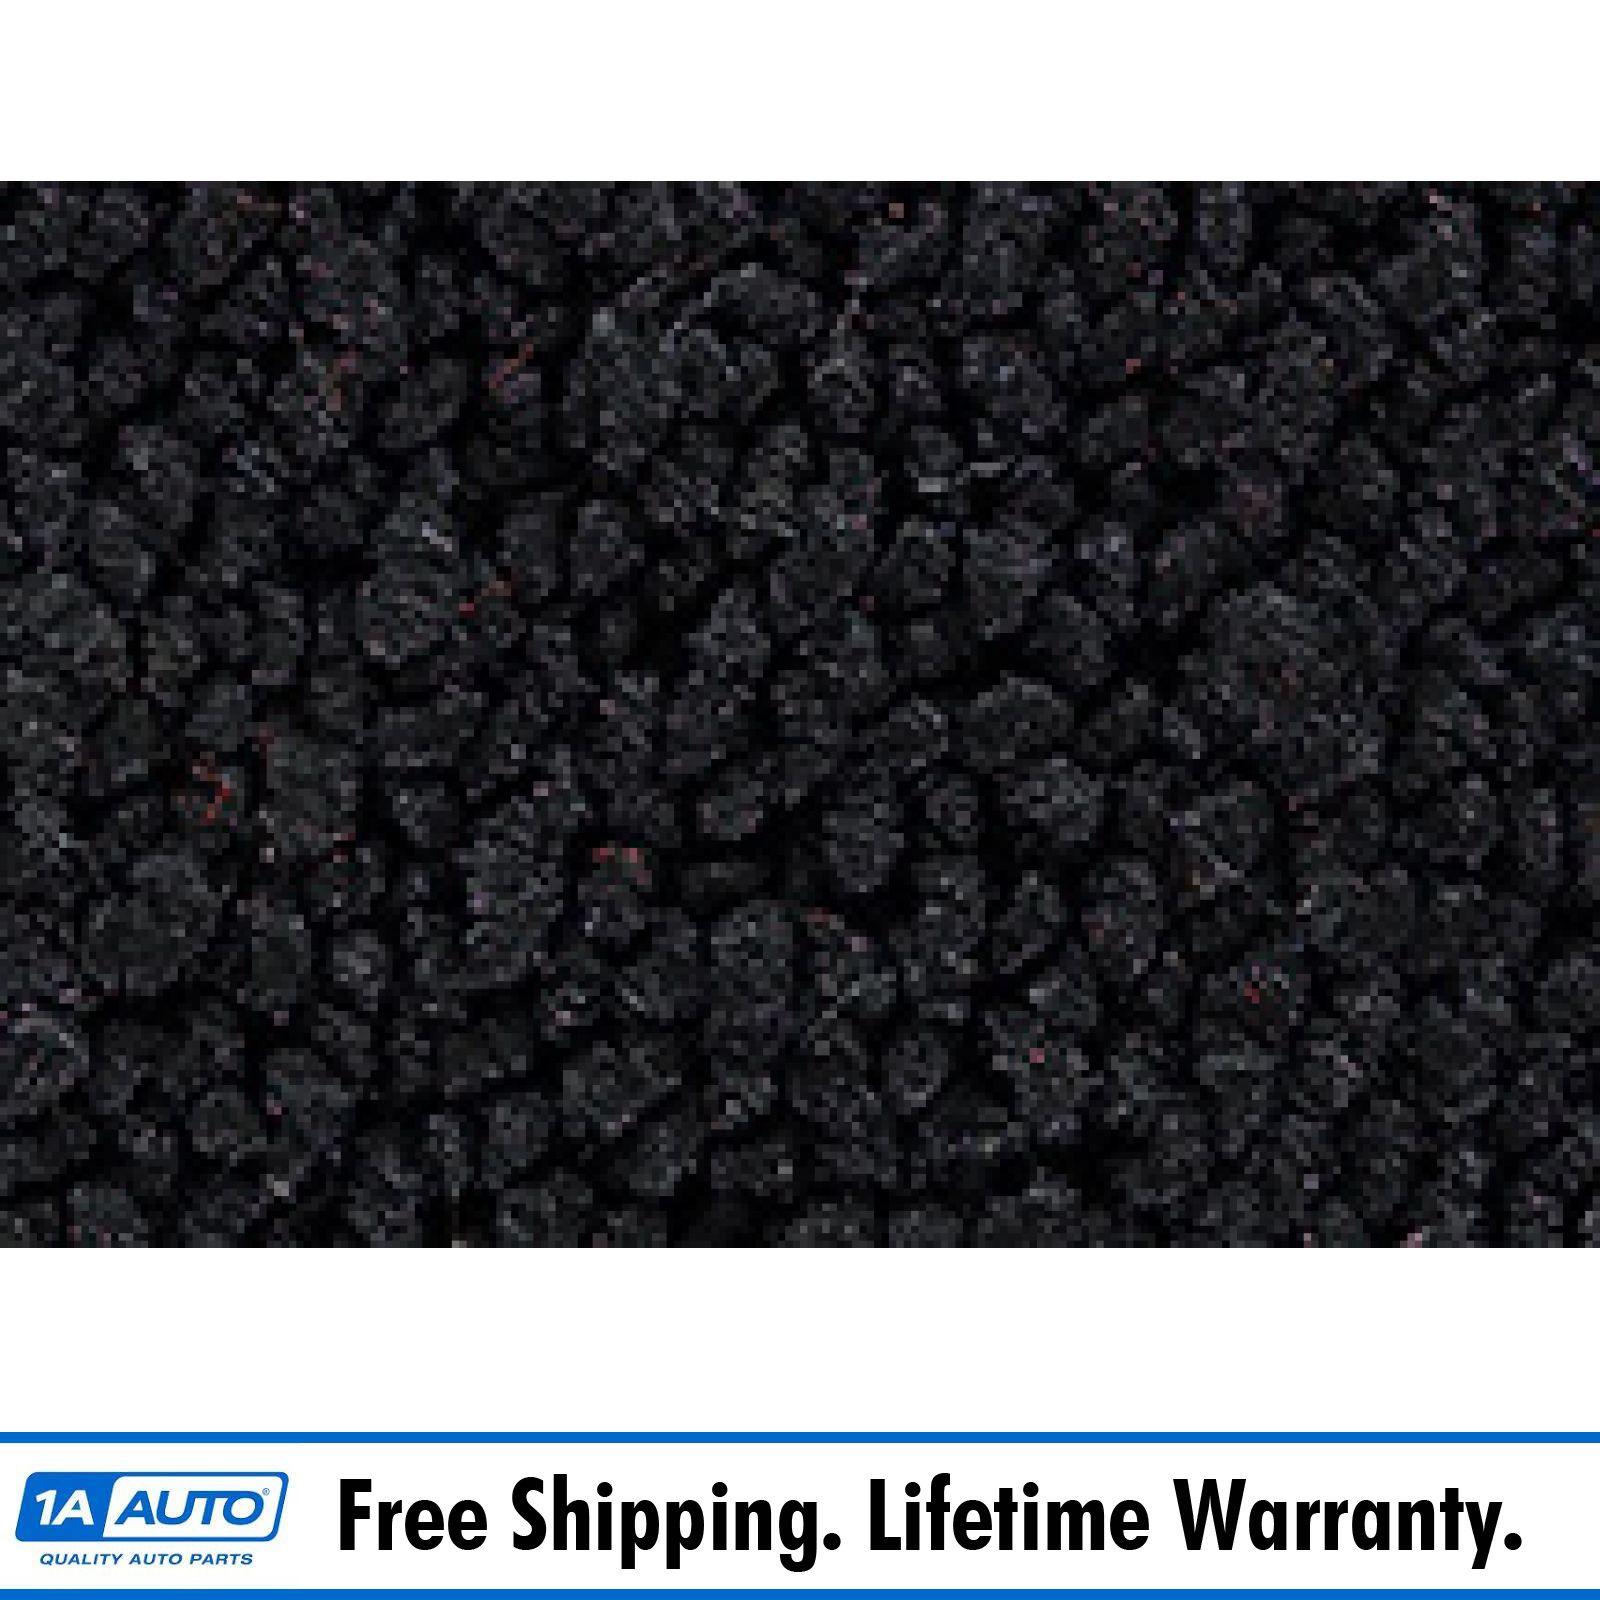 65-72 Ford F250 Reg Cab High Tunnel C6 Auto w//Frame Mounted Tank Carpet 01-Black